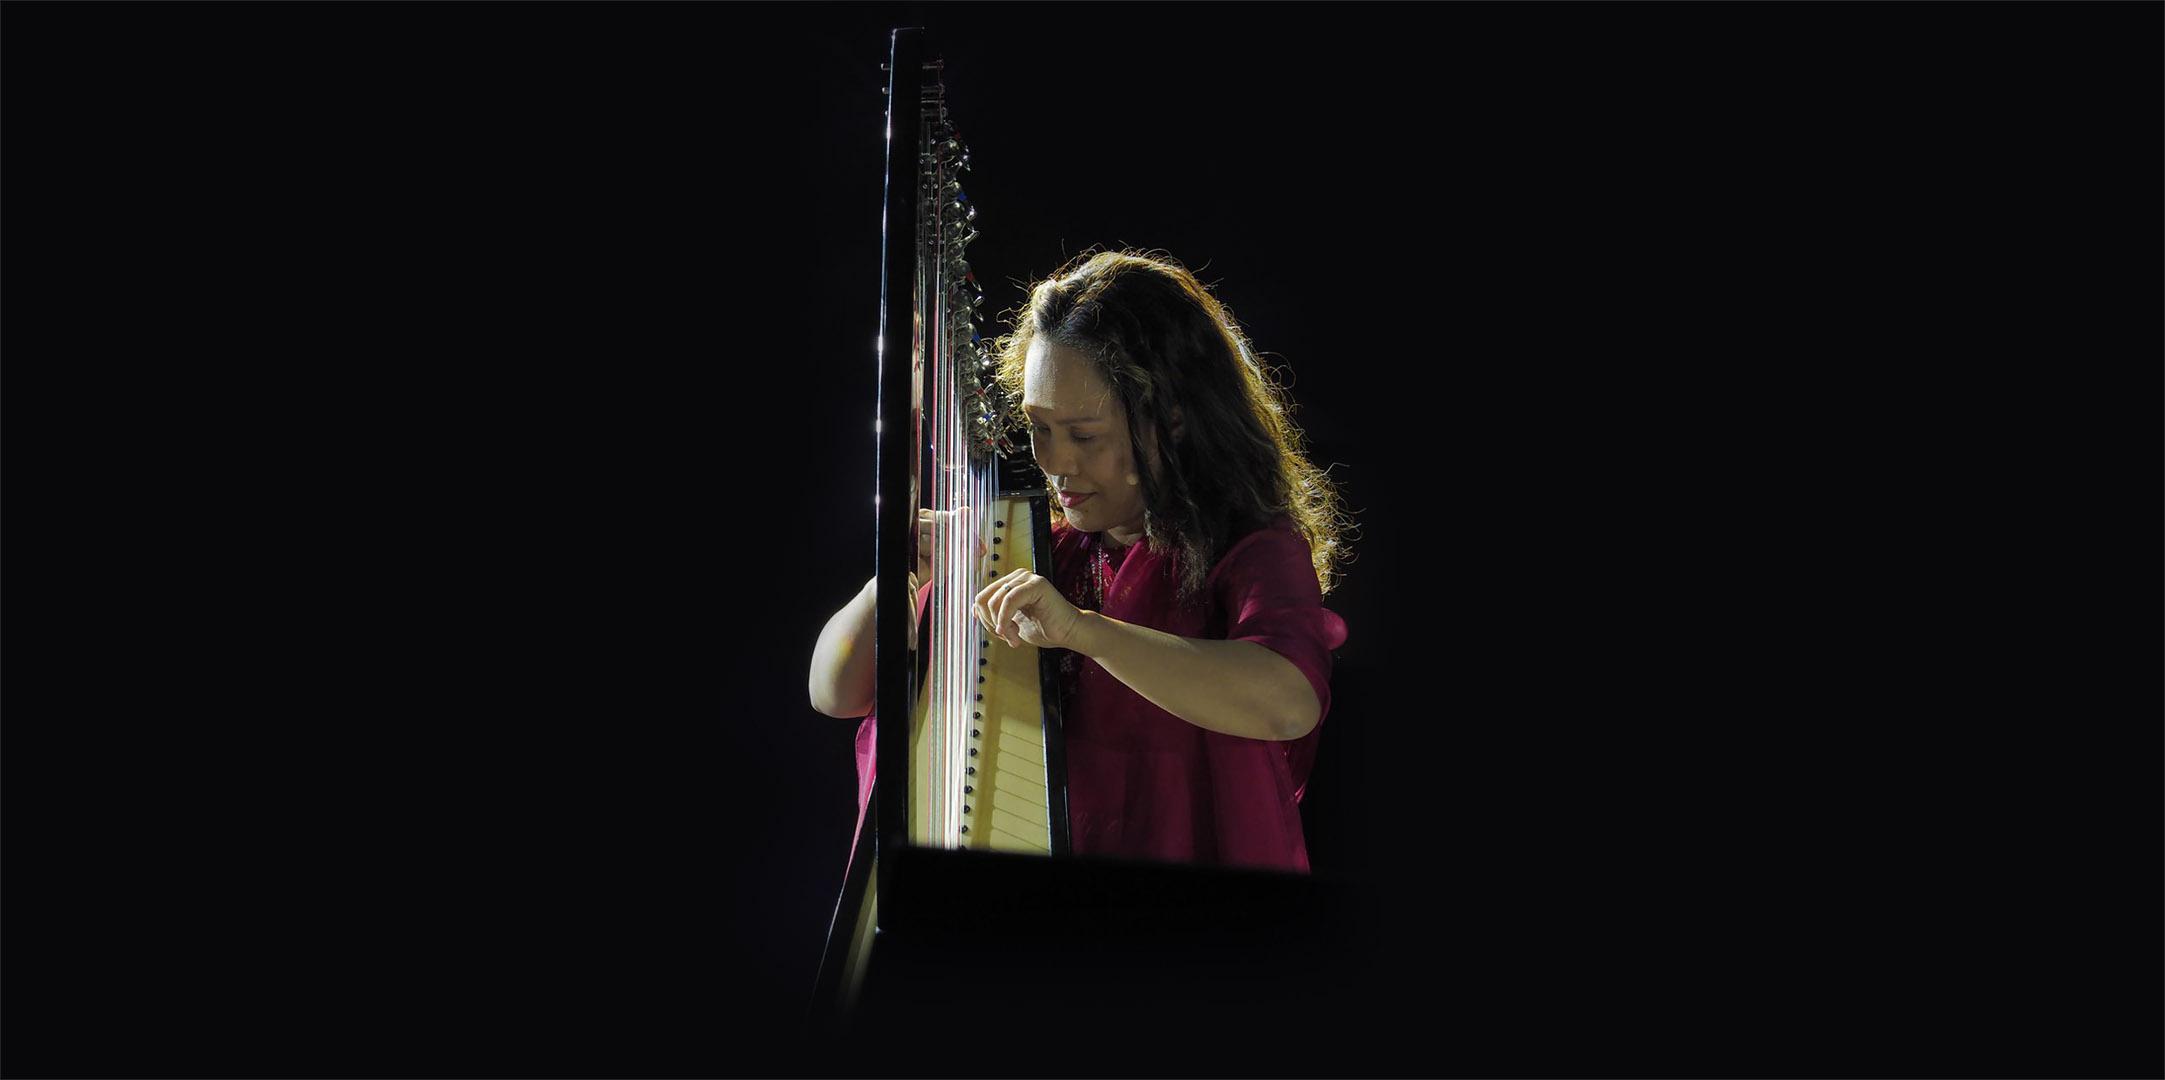 JoAnn Cerdenia, harpist